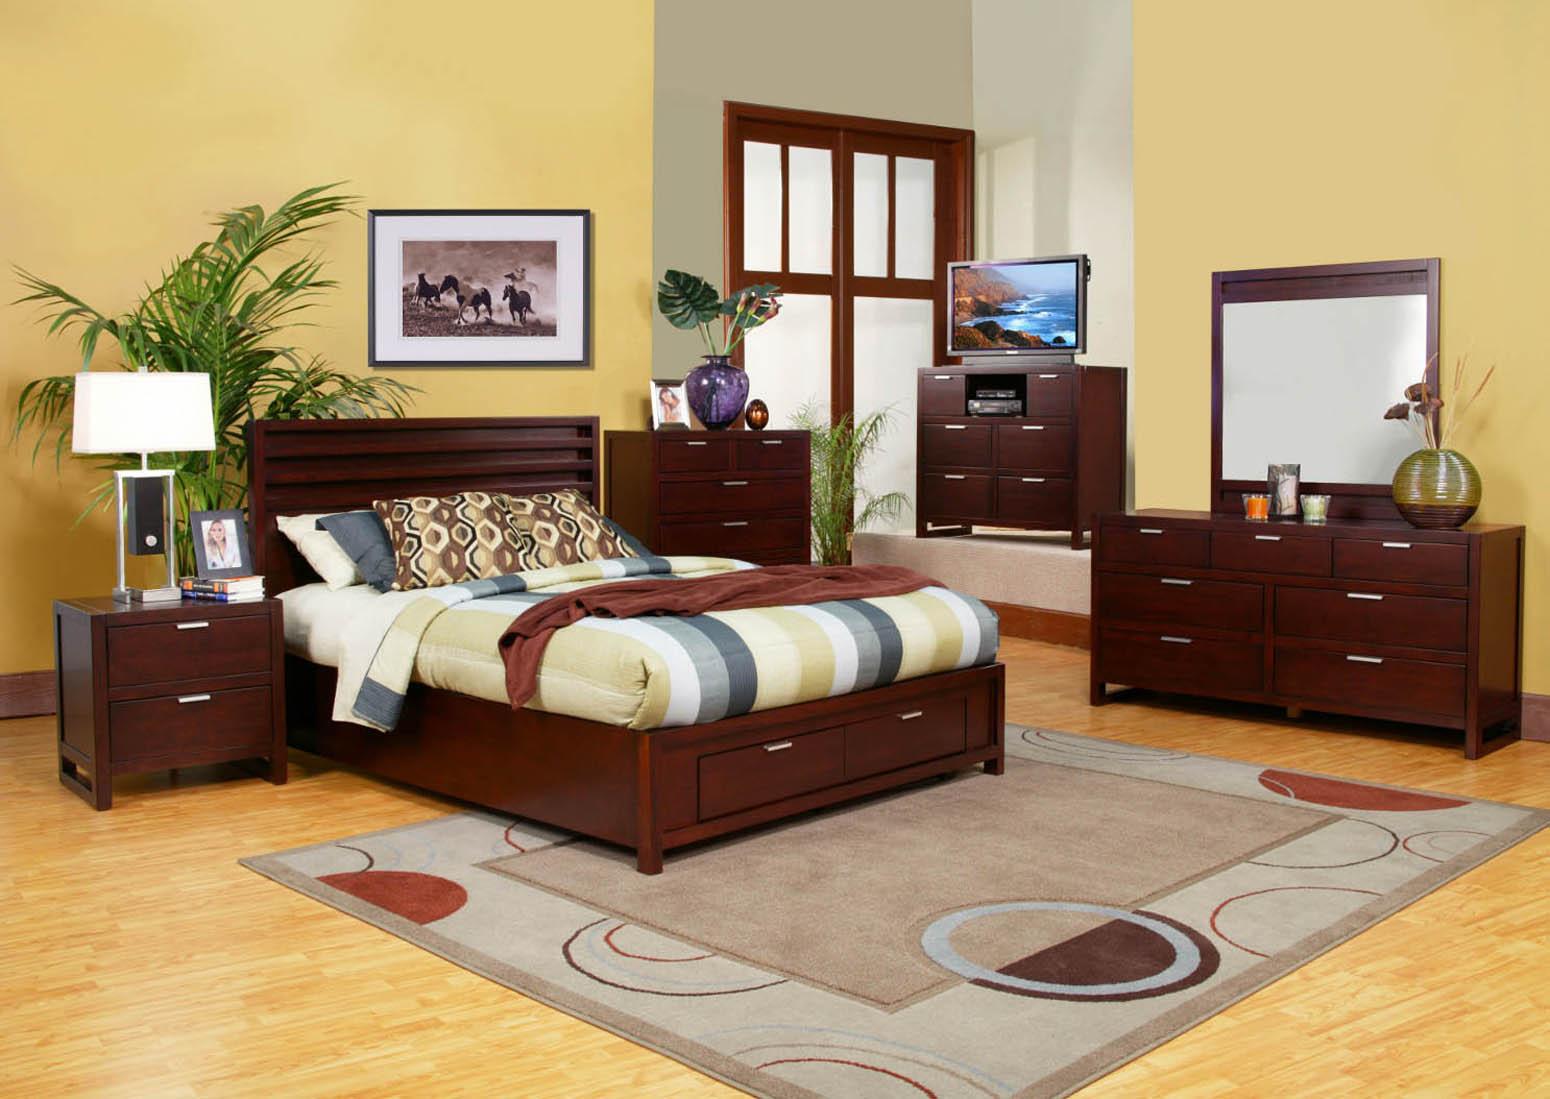 American Lifestyle 6-piece Camarillo Storage Bedroom Set